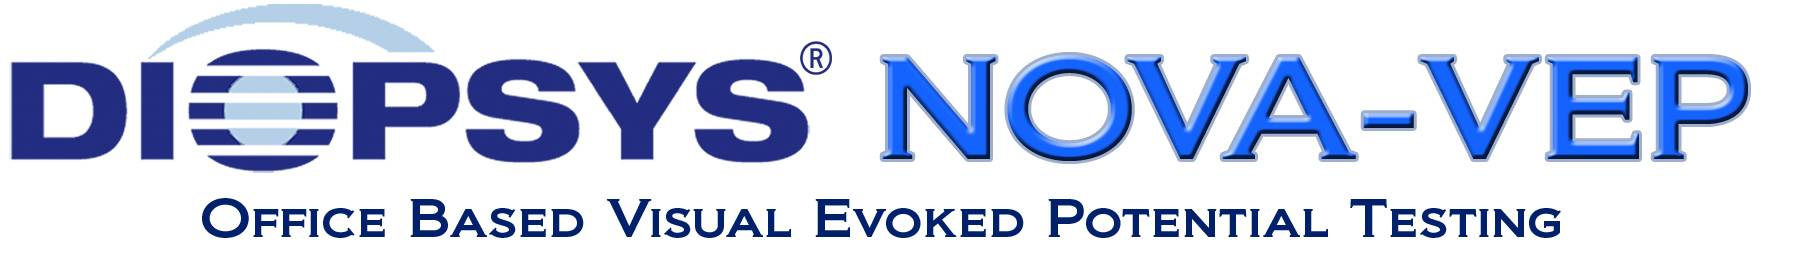 Diopsys NOVA VEP Logo